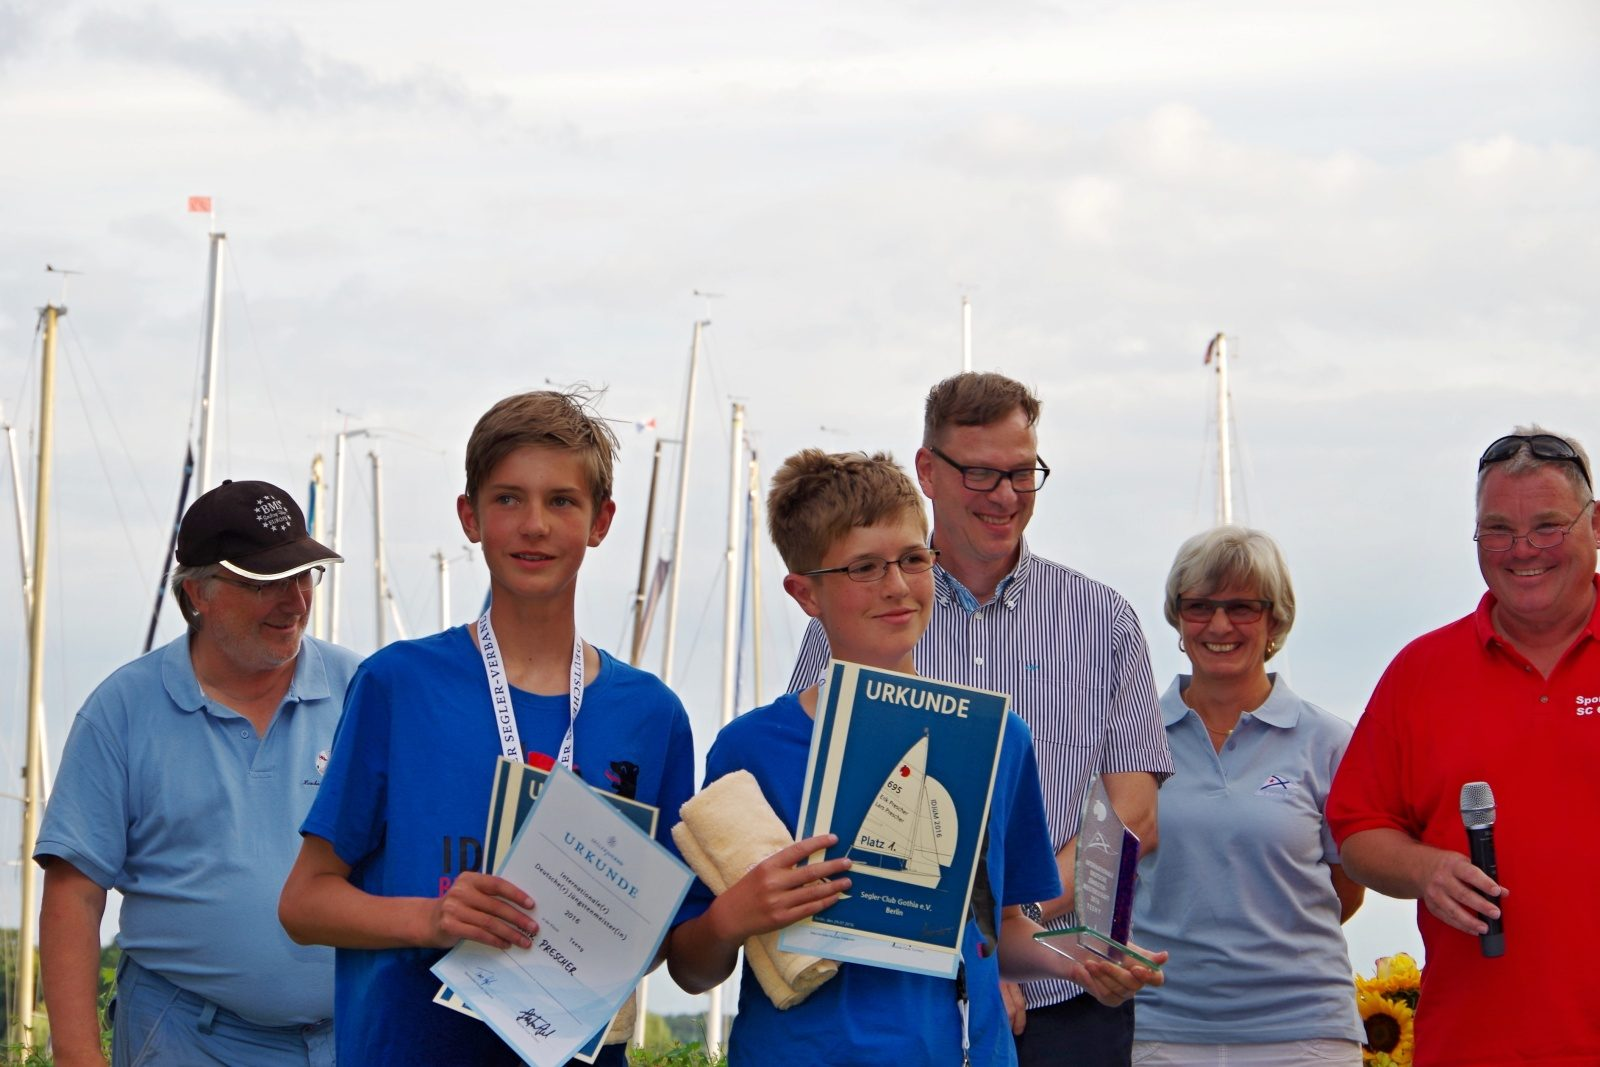 1. Platz GER 695, Erik und Lars Prescher - IDJüM 2016 im Teeny im SC Gothia e.V. in Berlin Spandau, 29. Juli 2016